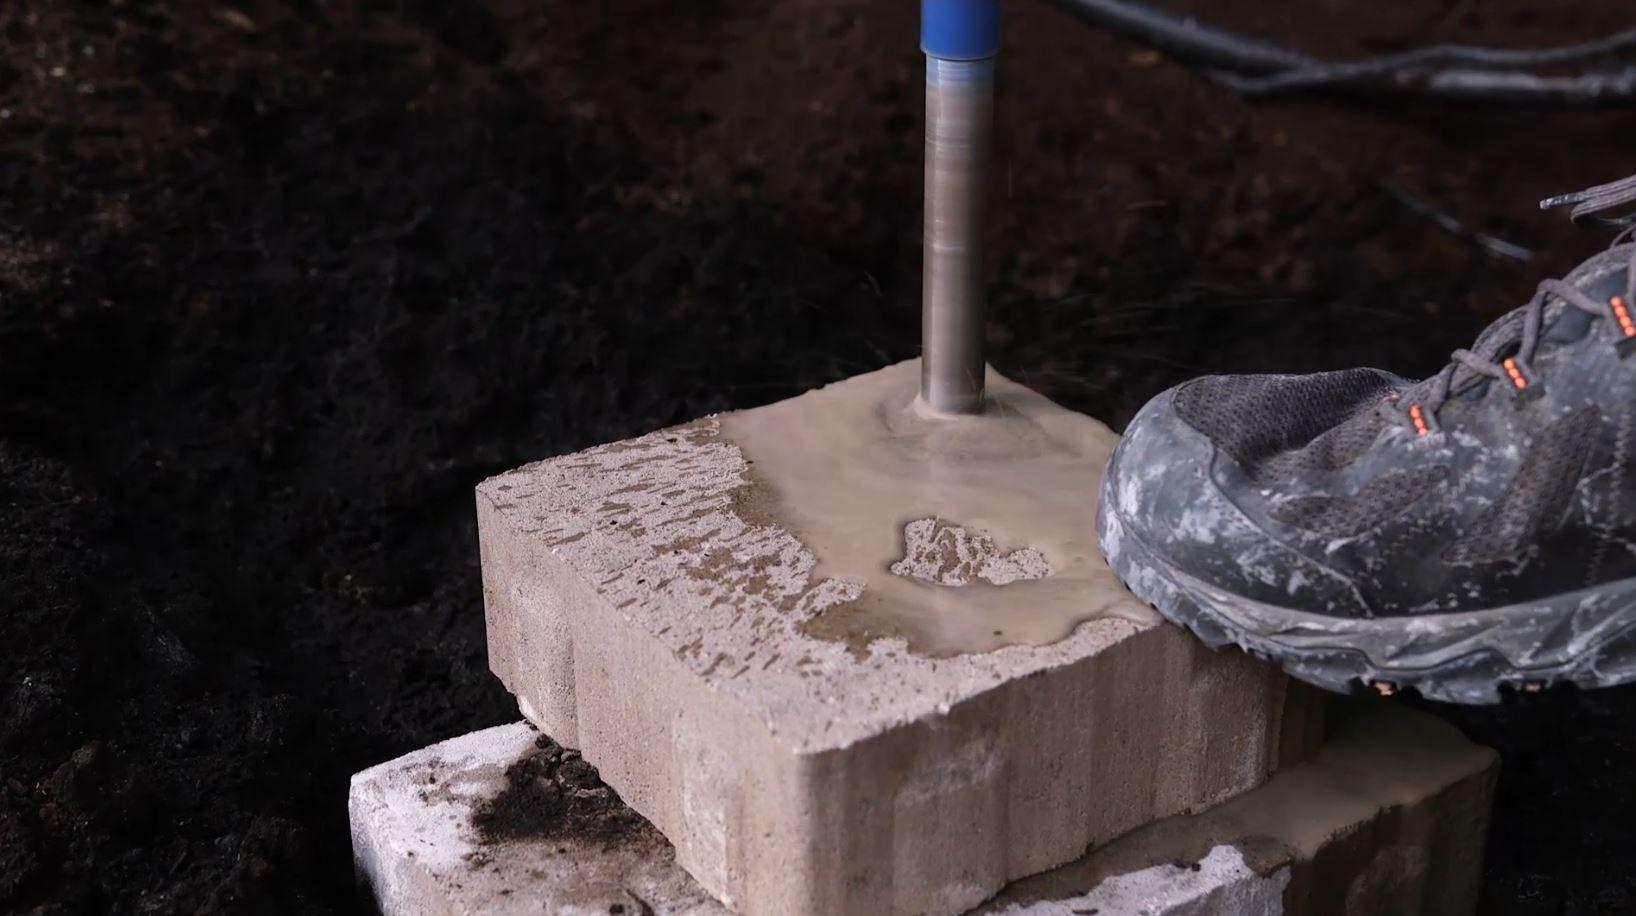 piercing a hole-1